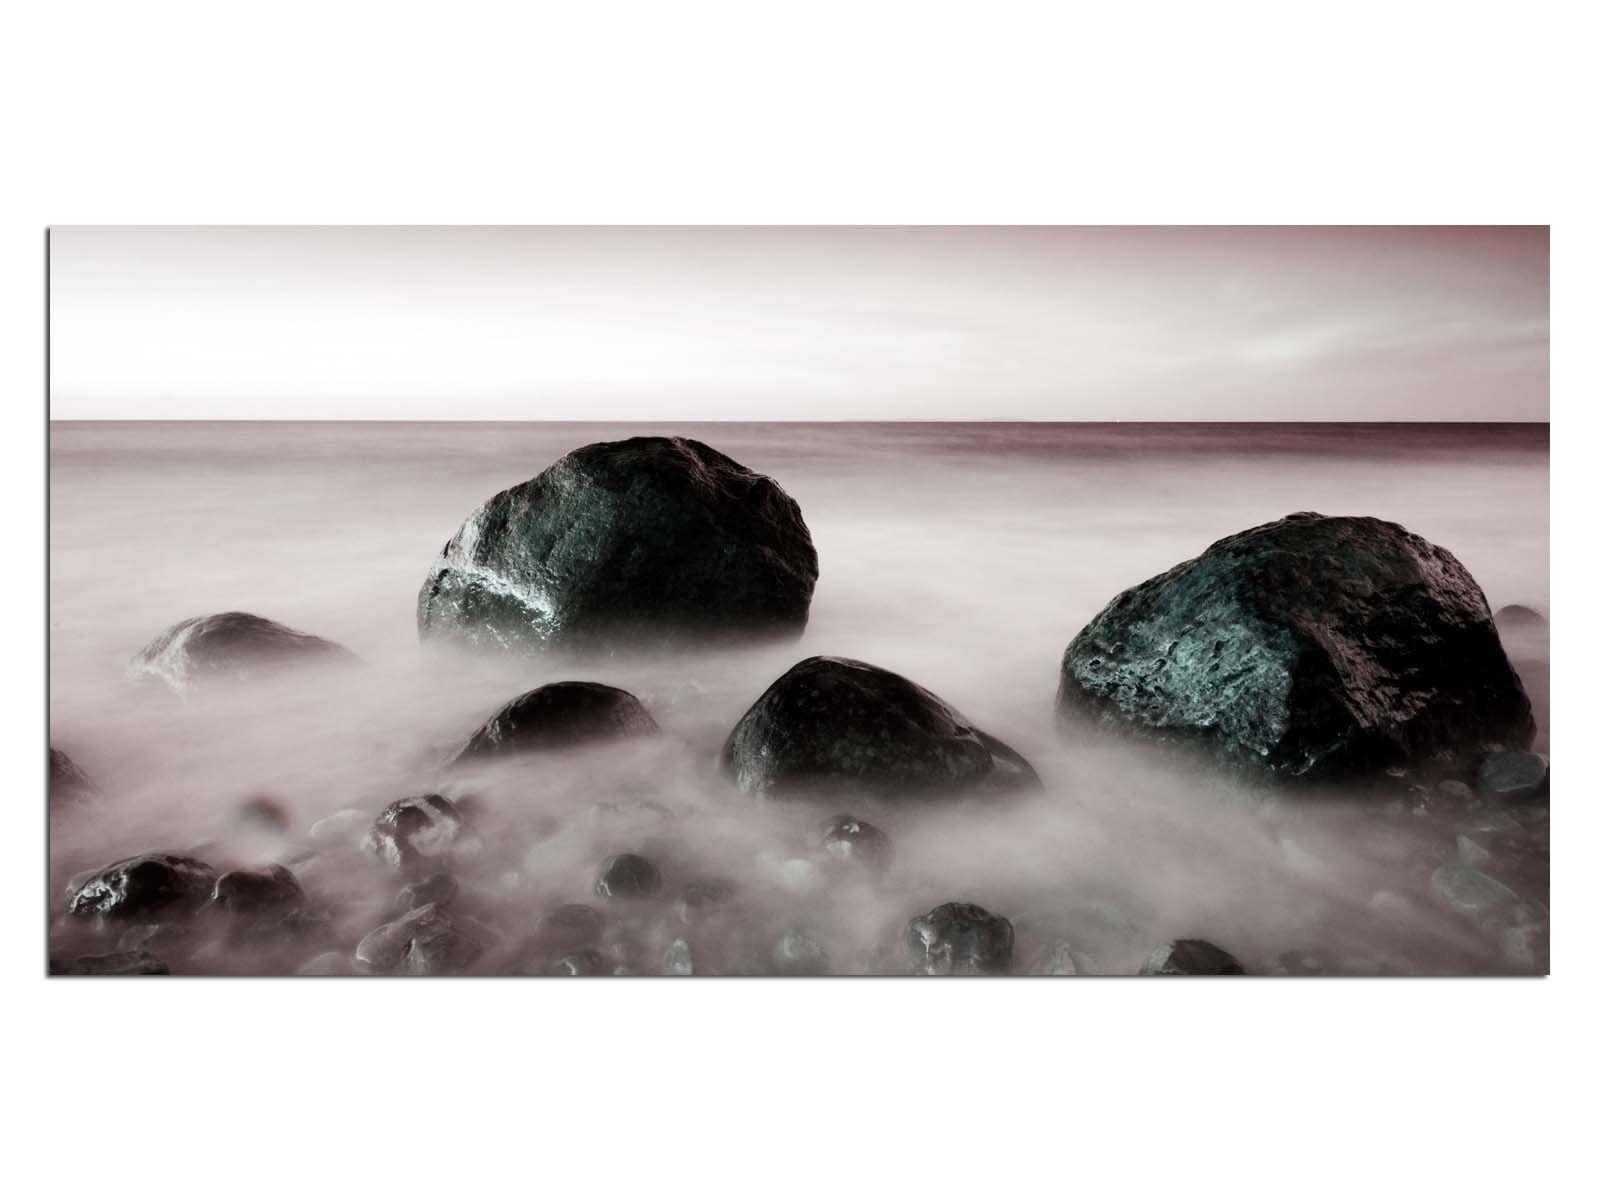 Deco Glass Picture EG4100500823 FOG AT OCEAN EFFECT Größe 39,37  x 19,68  HD Prin